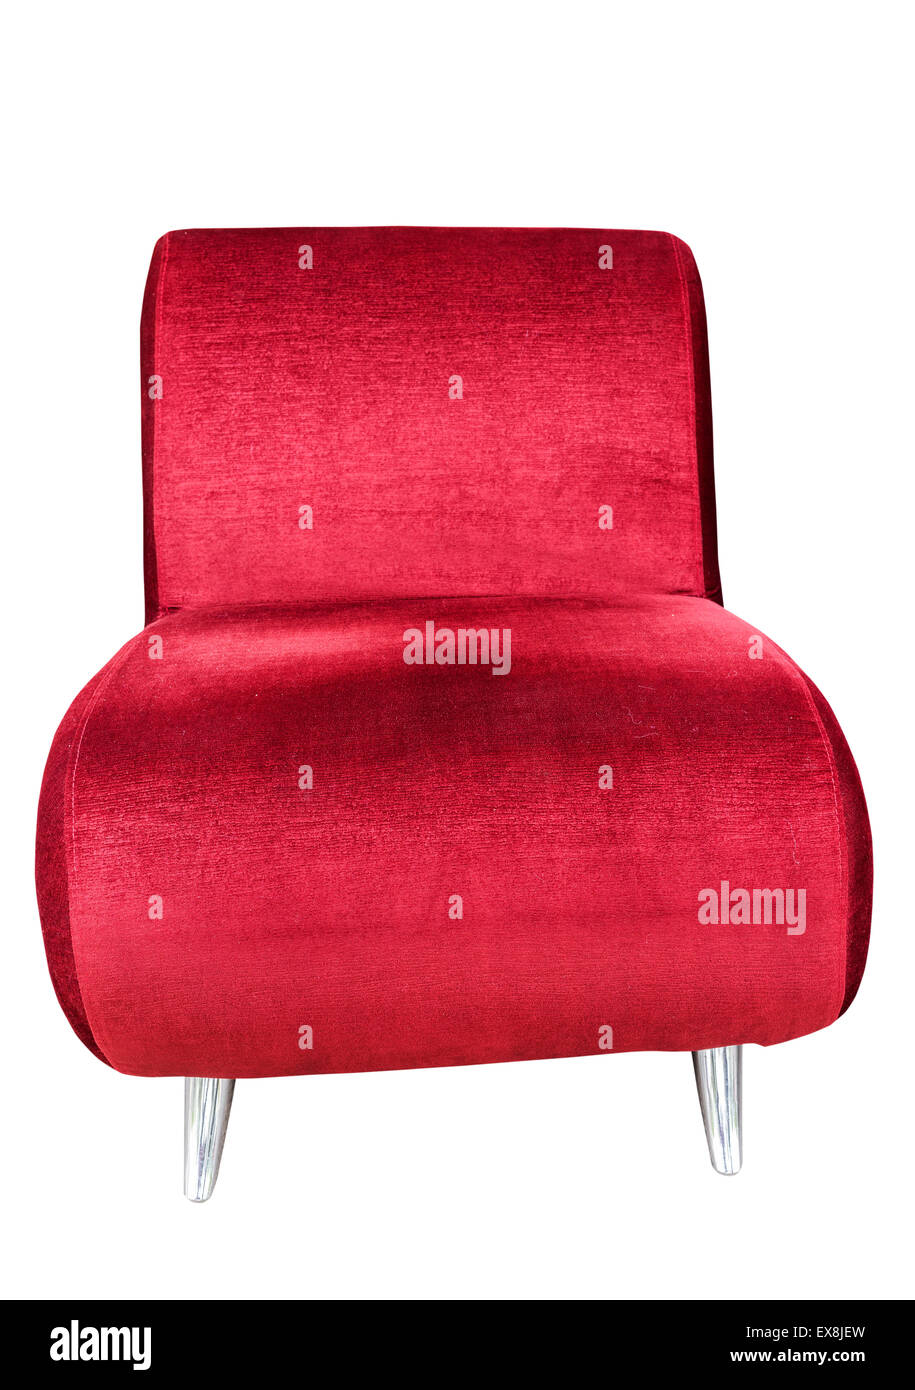 Asiento sofá rojo sobre fondo blanco aisladas con trazado de recorte Imagen De Stock